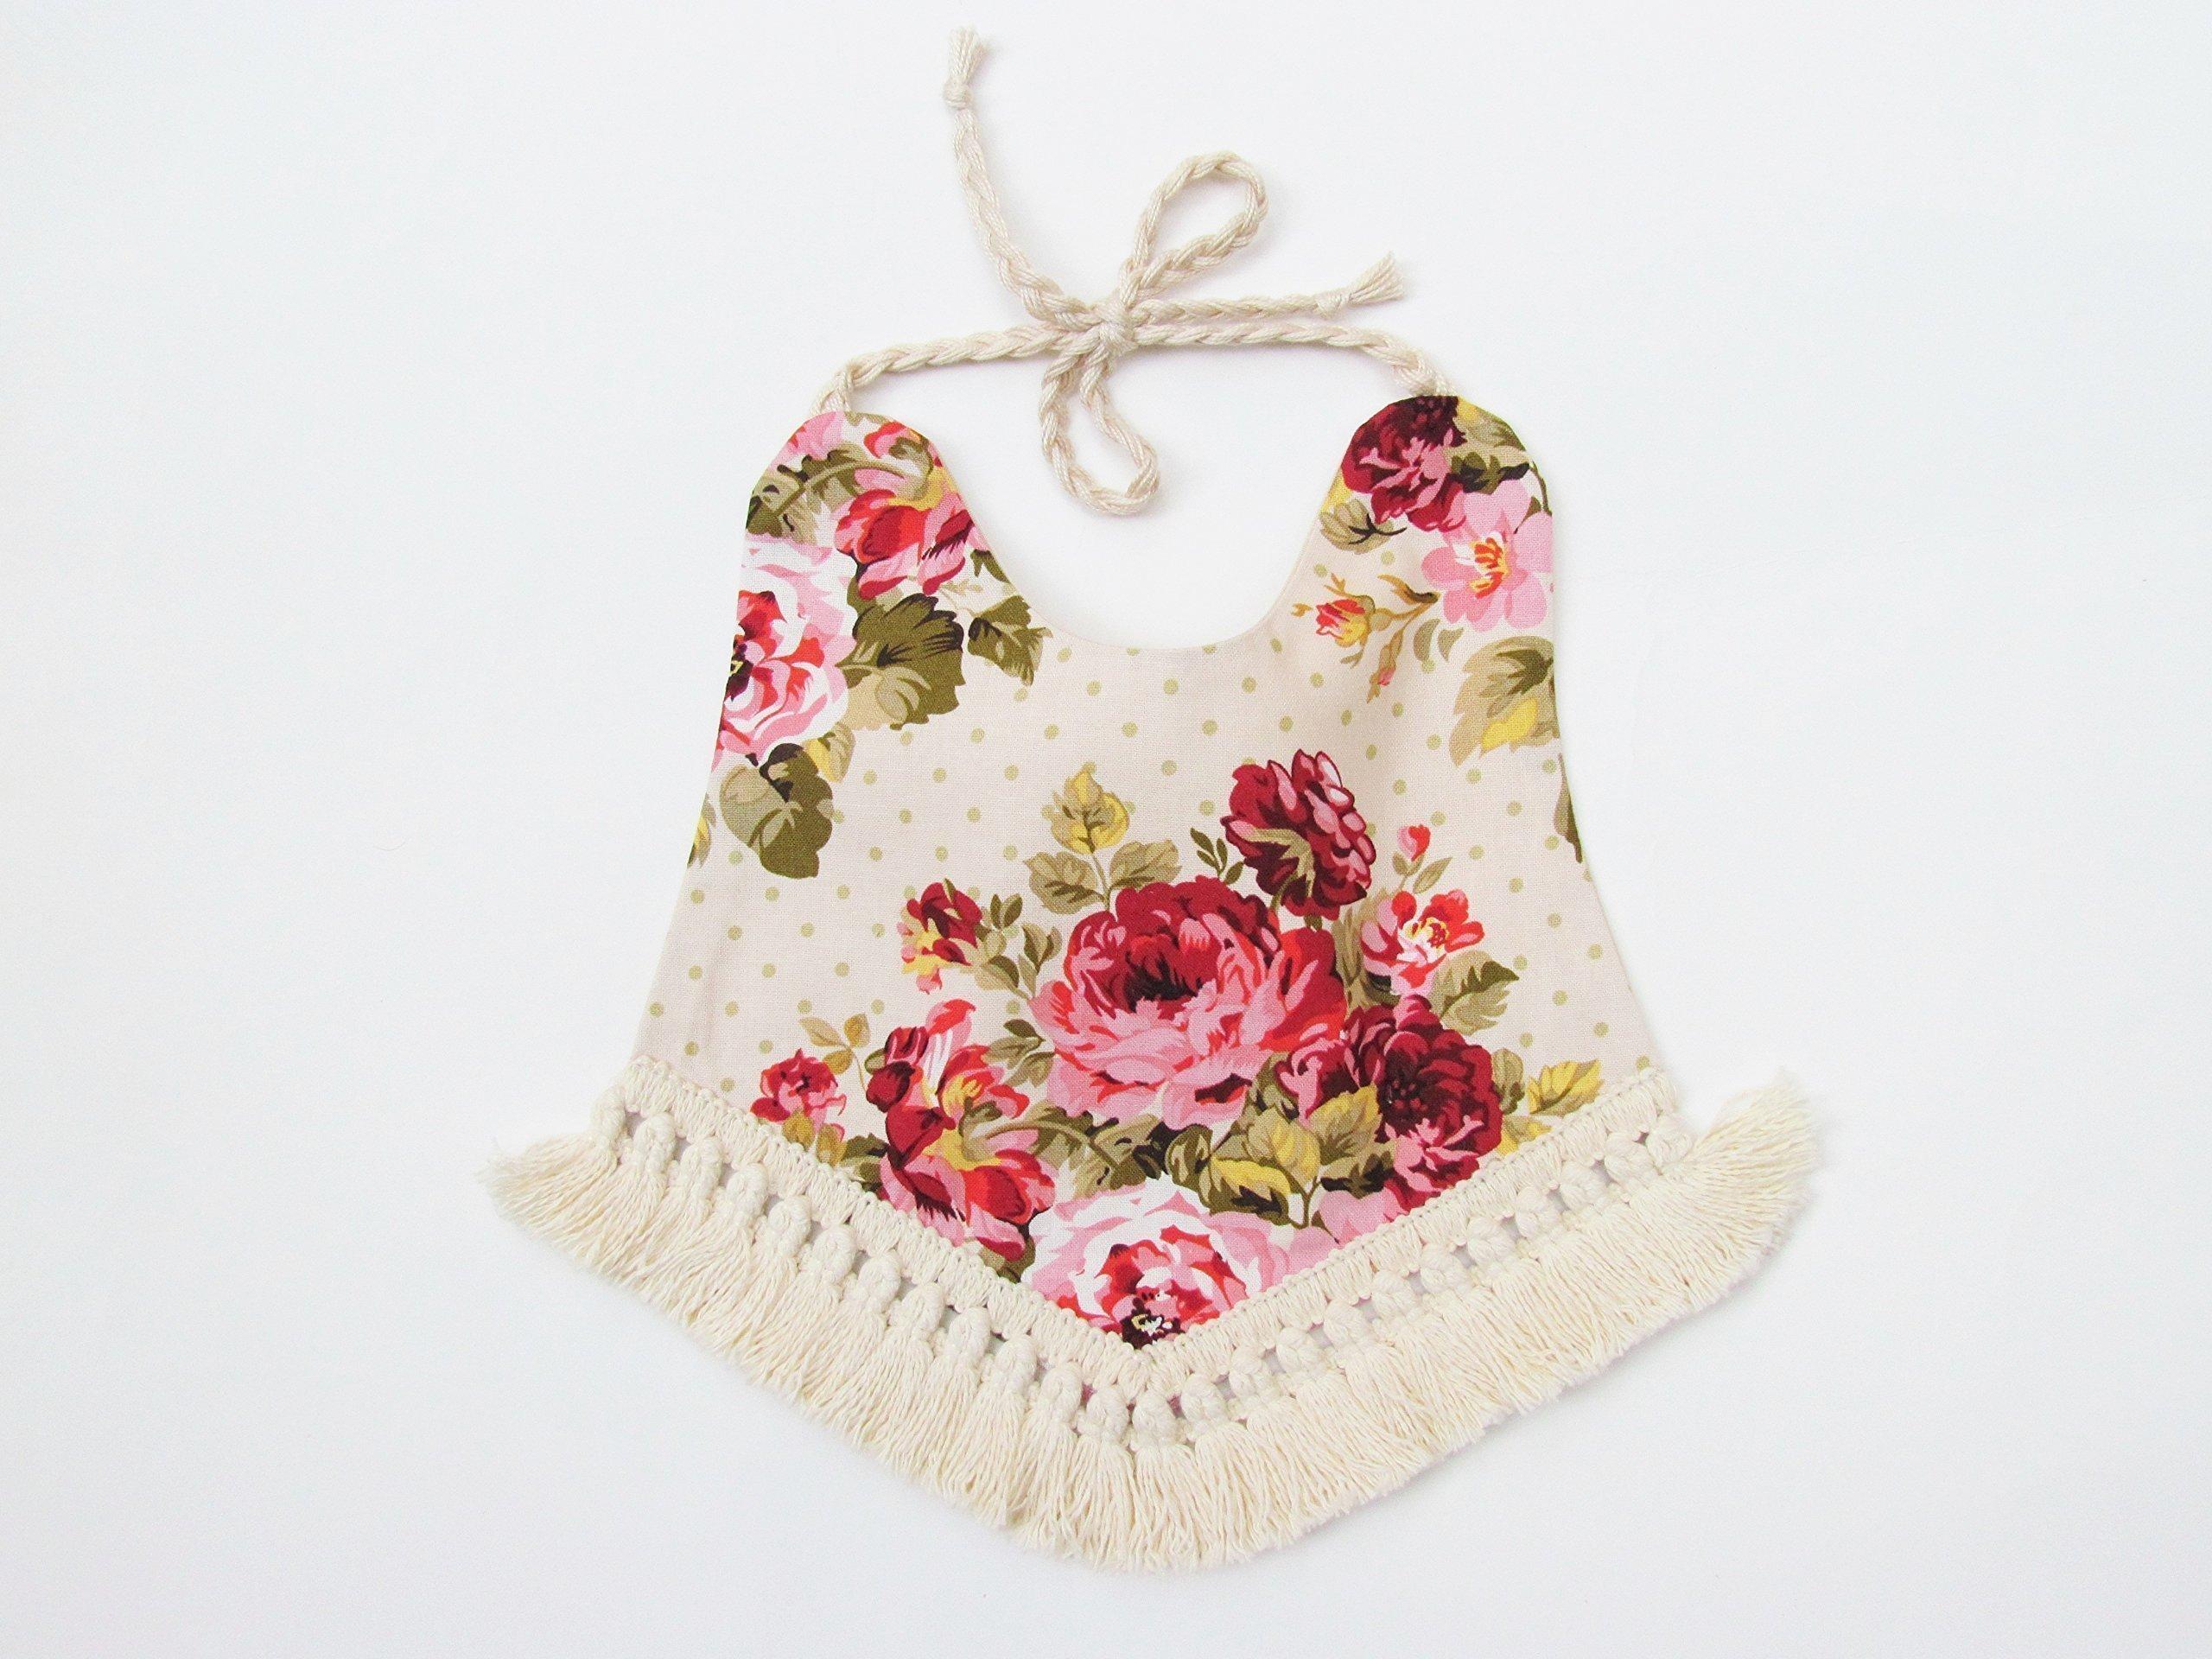 Baby Bib Reversible Boho Floral Design drool bib for Girls baby bib kerchief baby bib teether